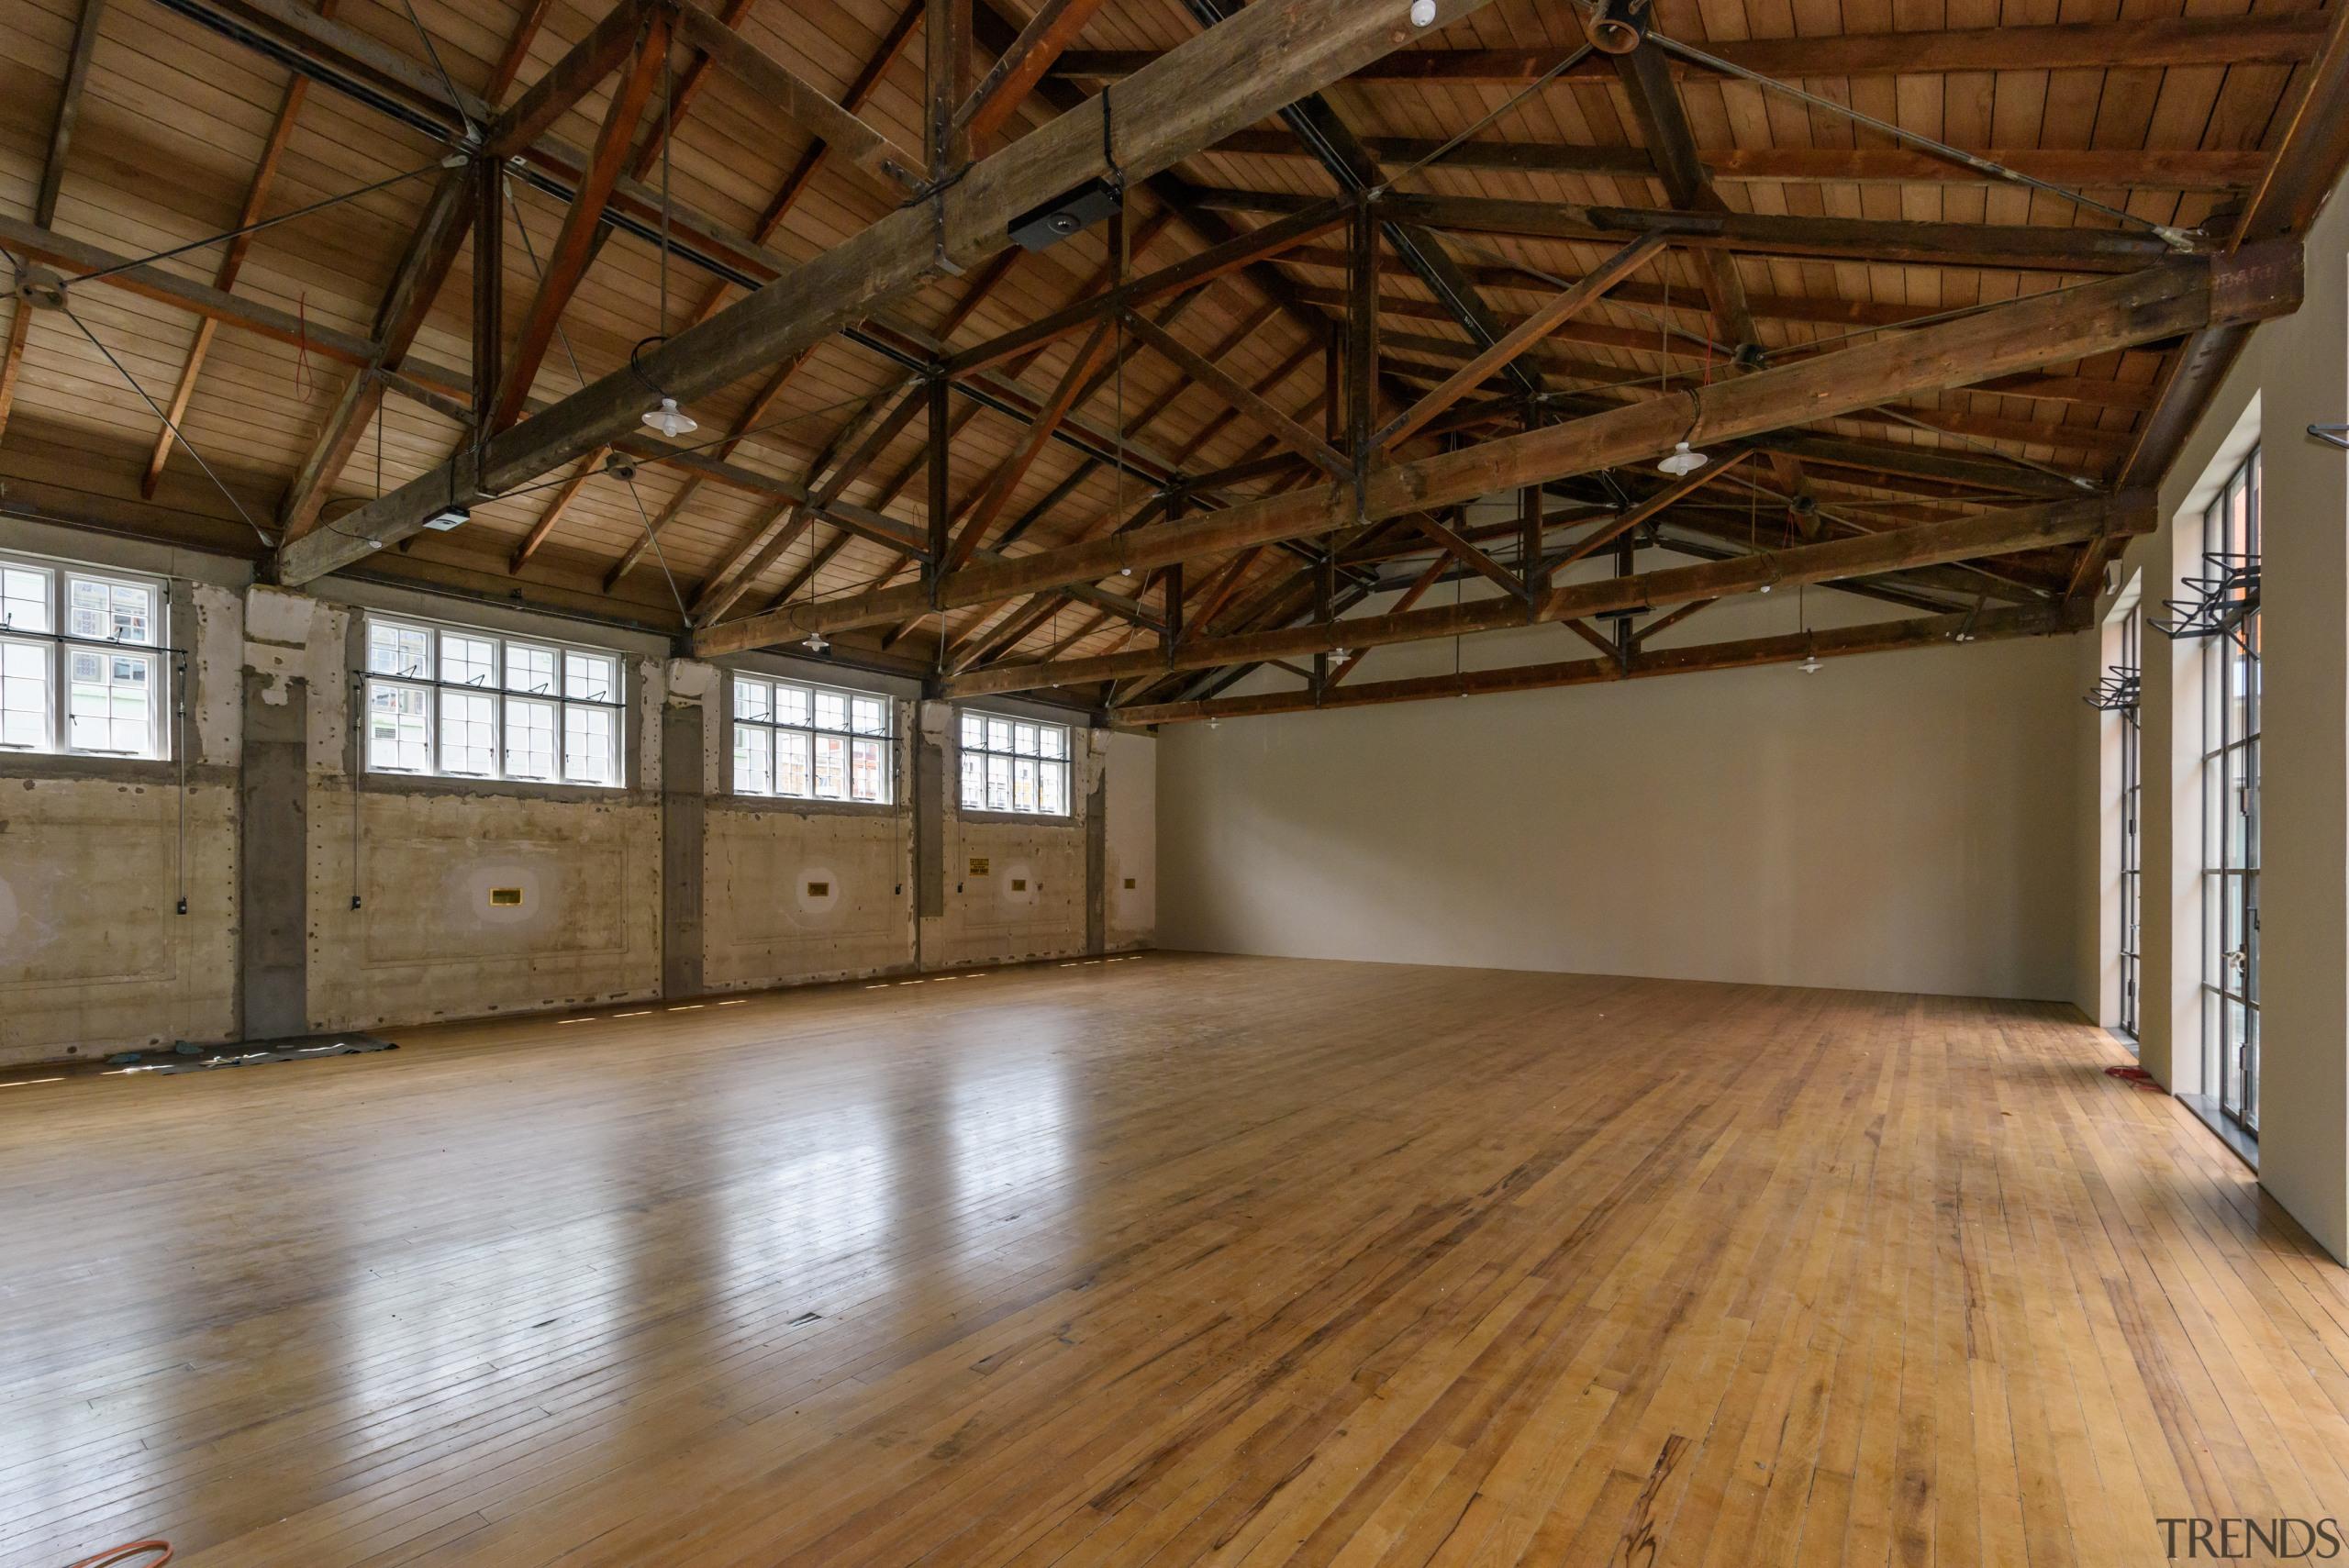 Work on the Orange Halls ground level Ballroom attic, floor, flooring, hardwood, loft, property, real estate, structure, wood, wood flooring, brown